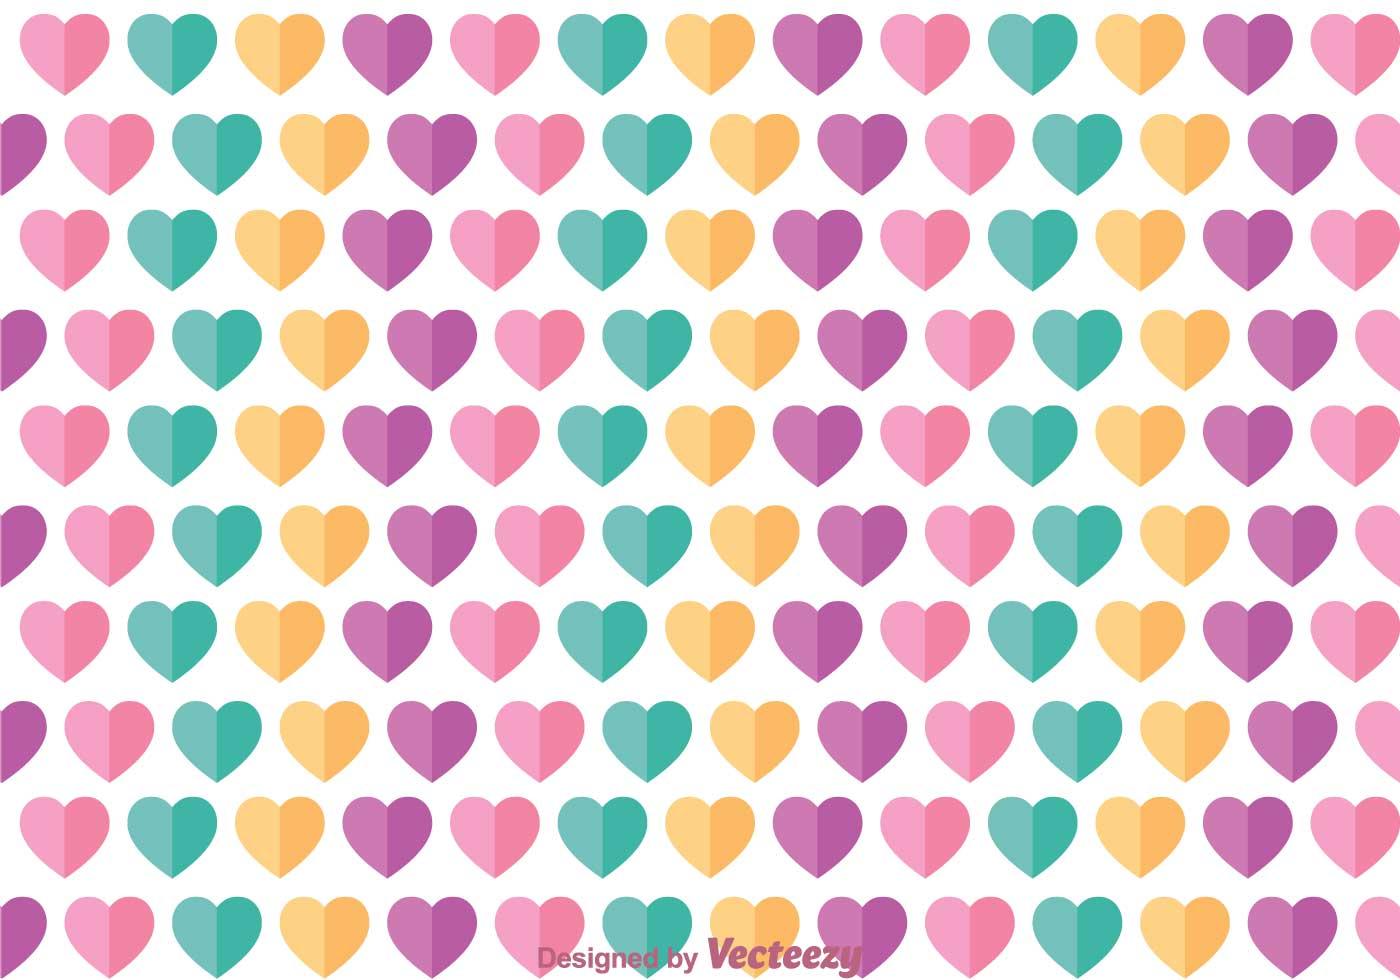 Girly Pattern Free Vector Art - (9453 Free Downloads)